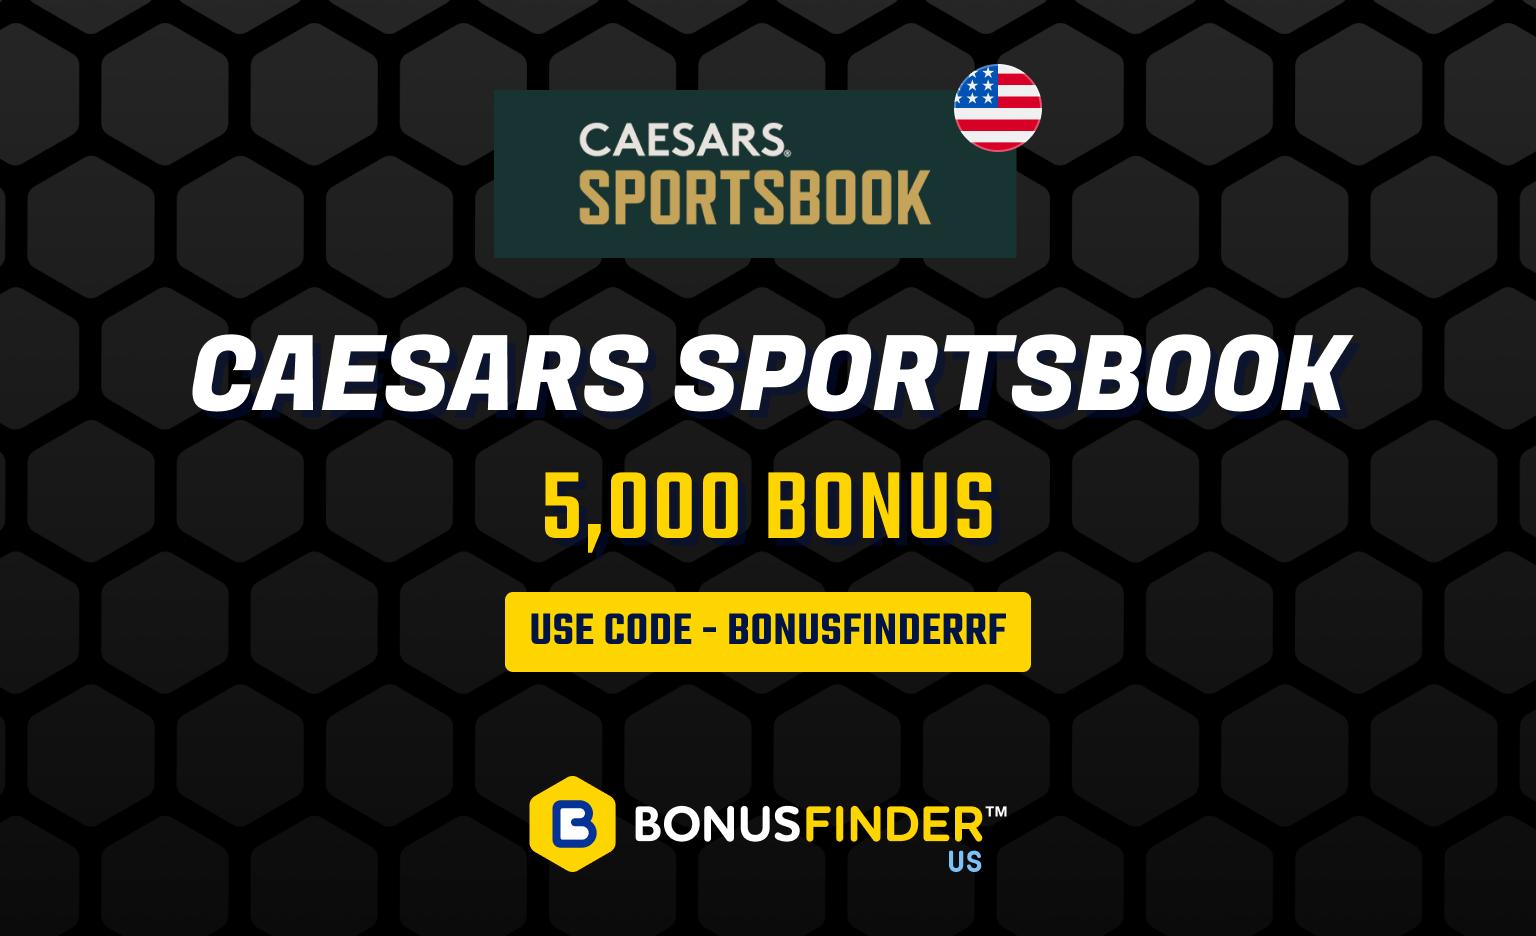 caesars sportsbook 5,000 bonus